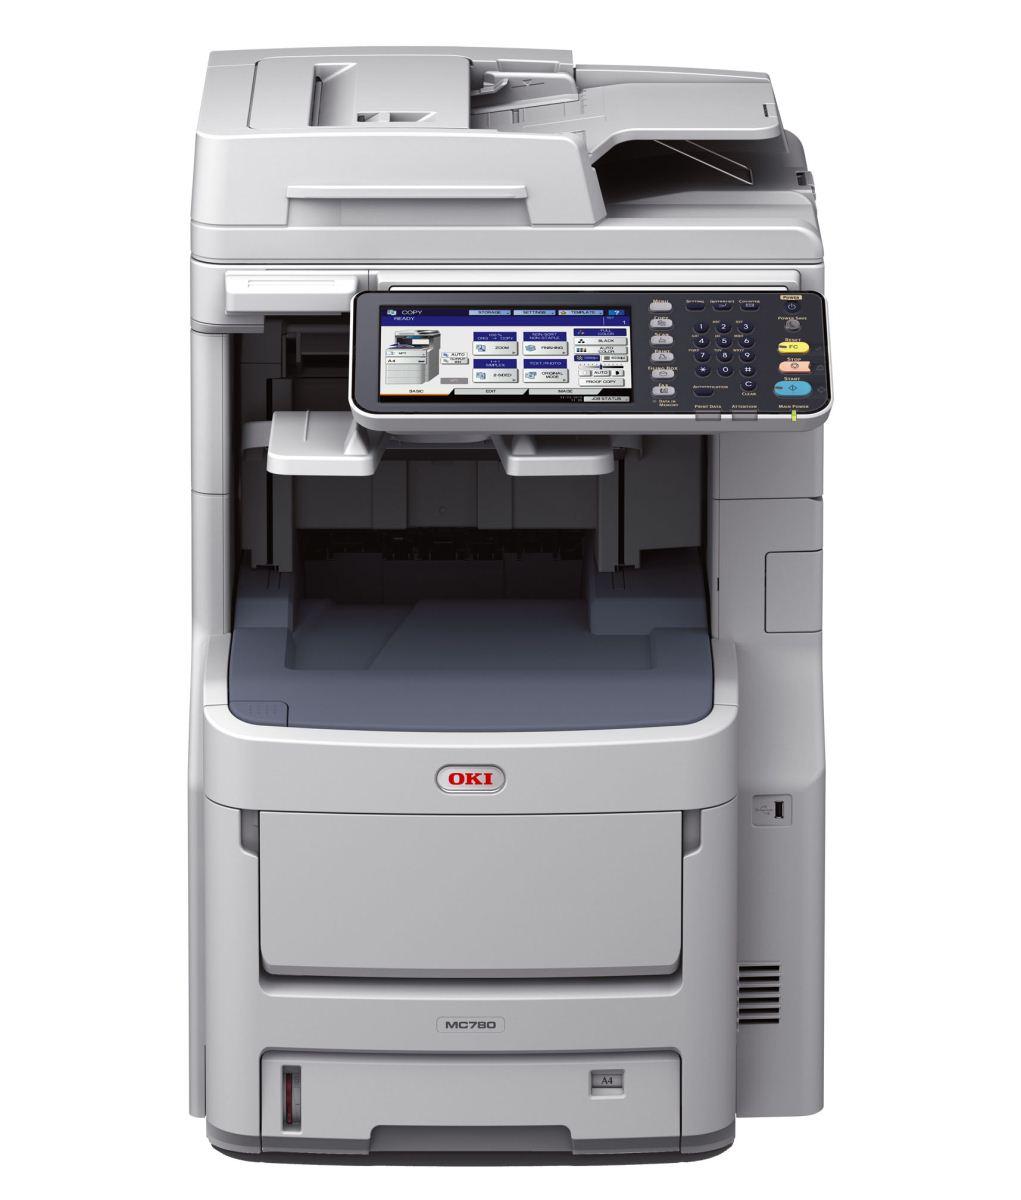 OKI MC780